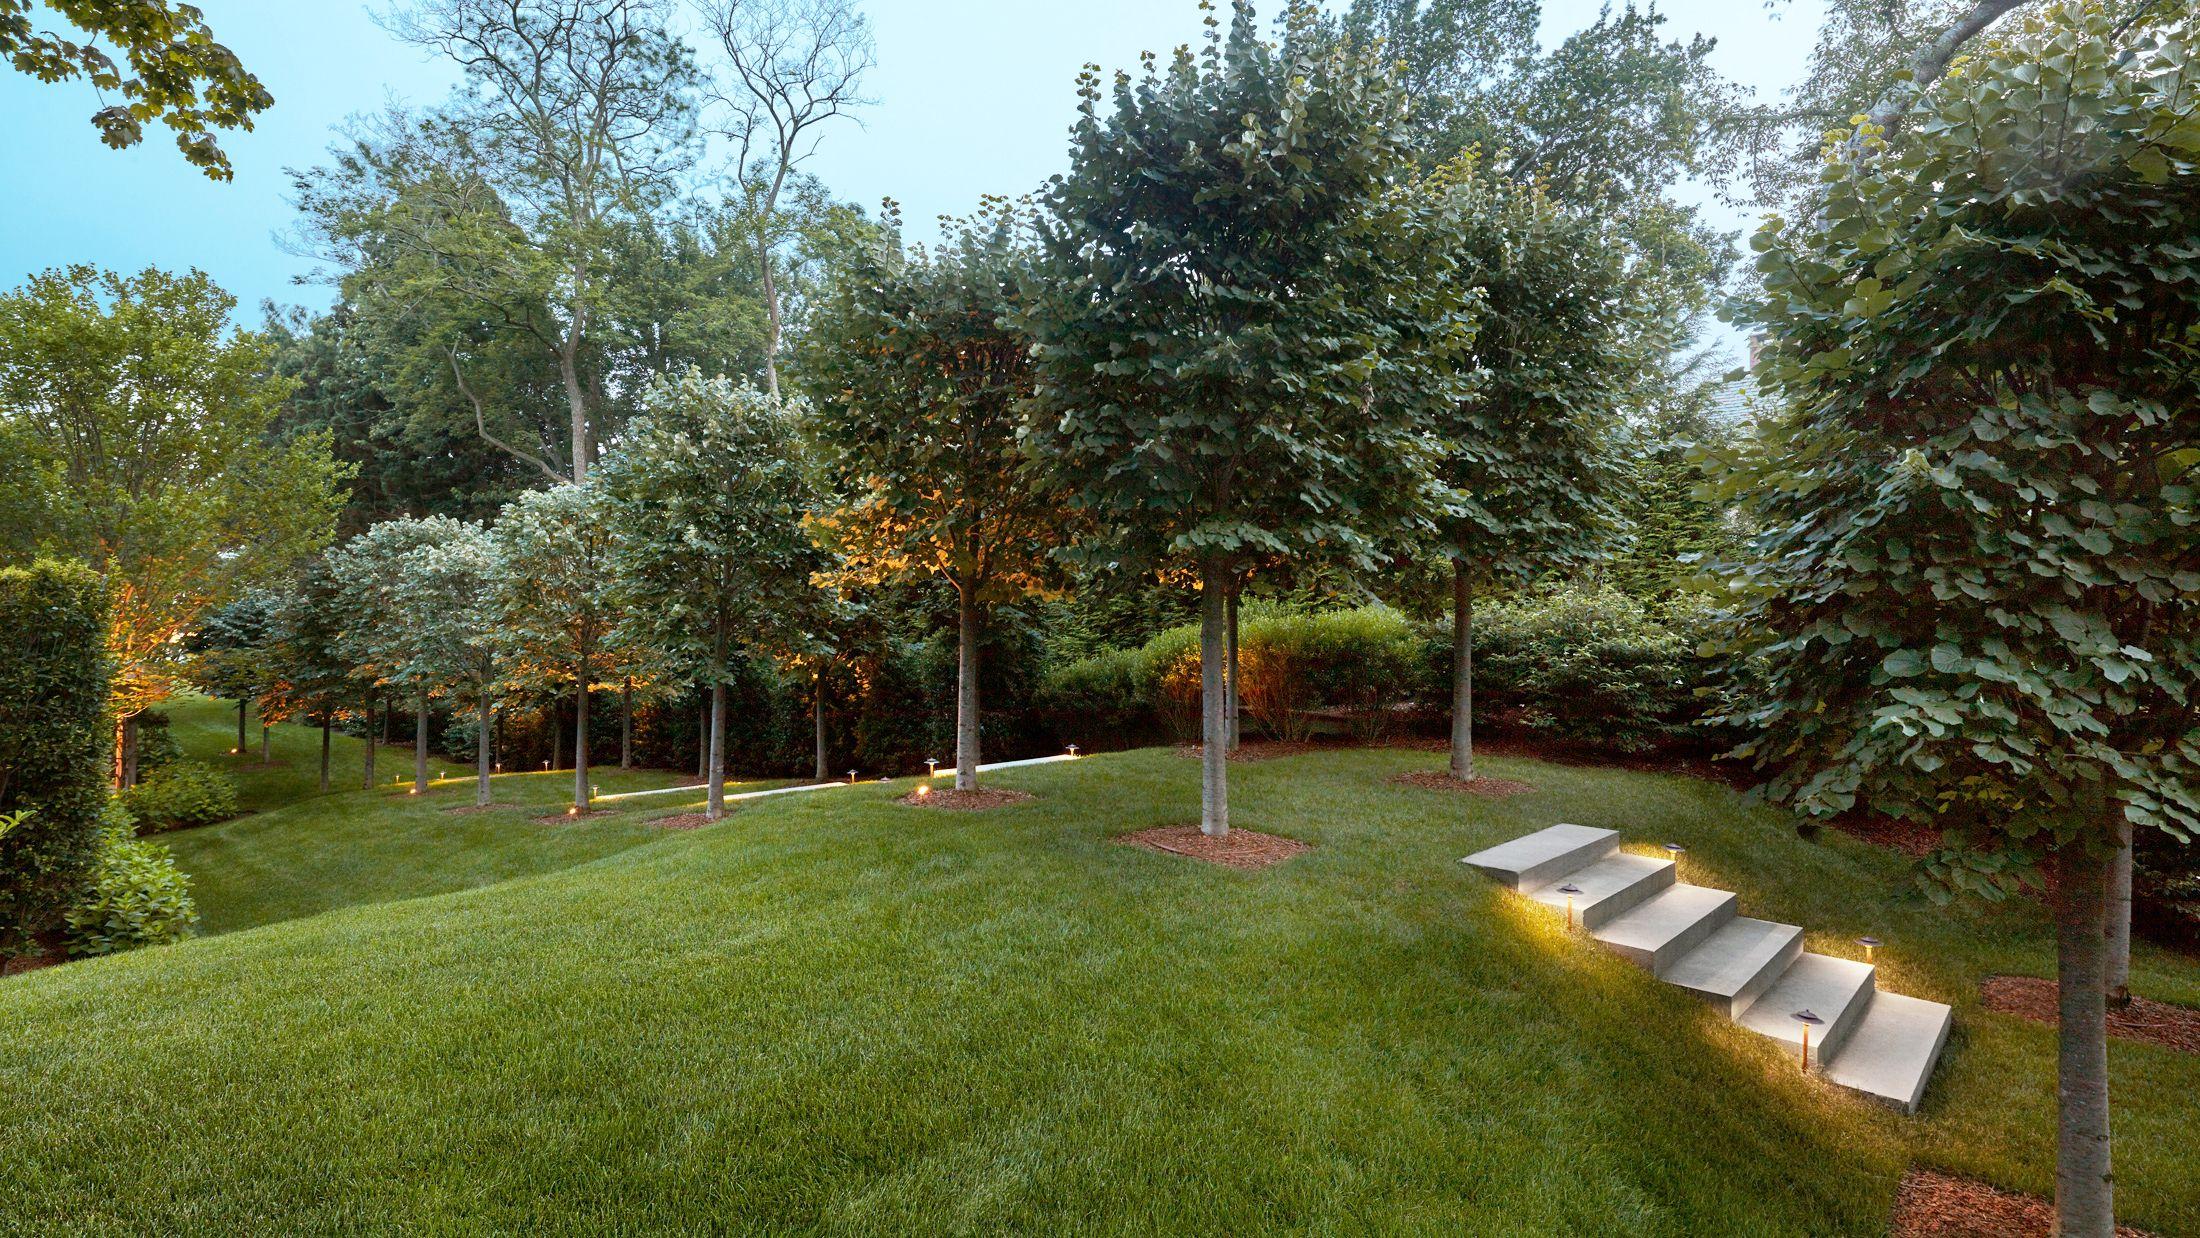 15 Stylish Outdoor Lighting Ideas The Best Backyard Light Options